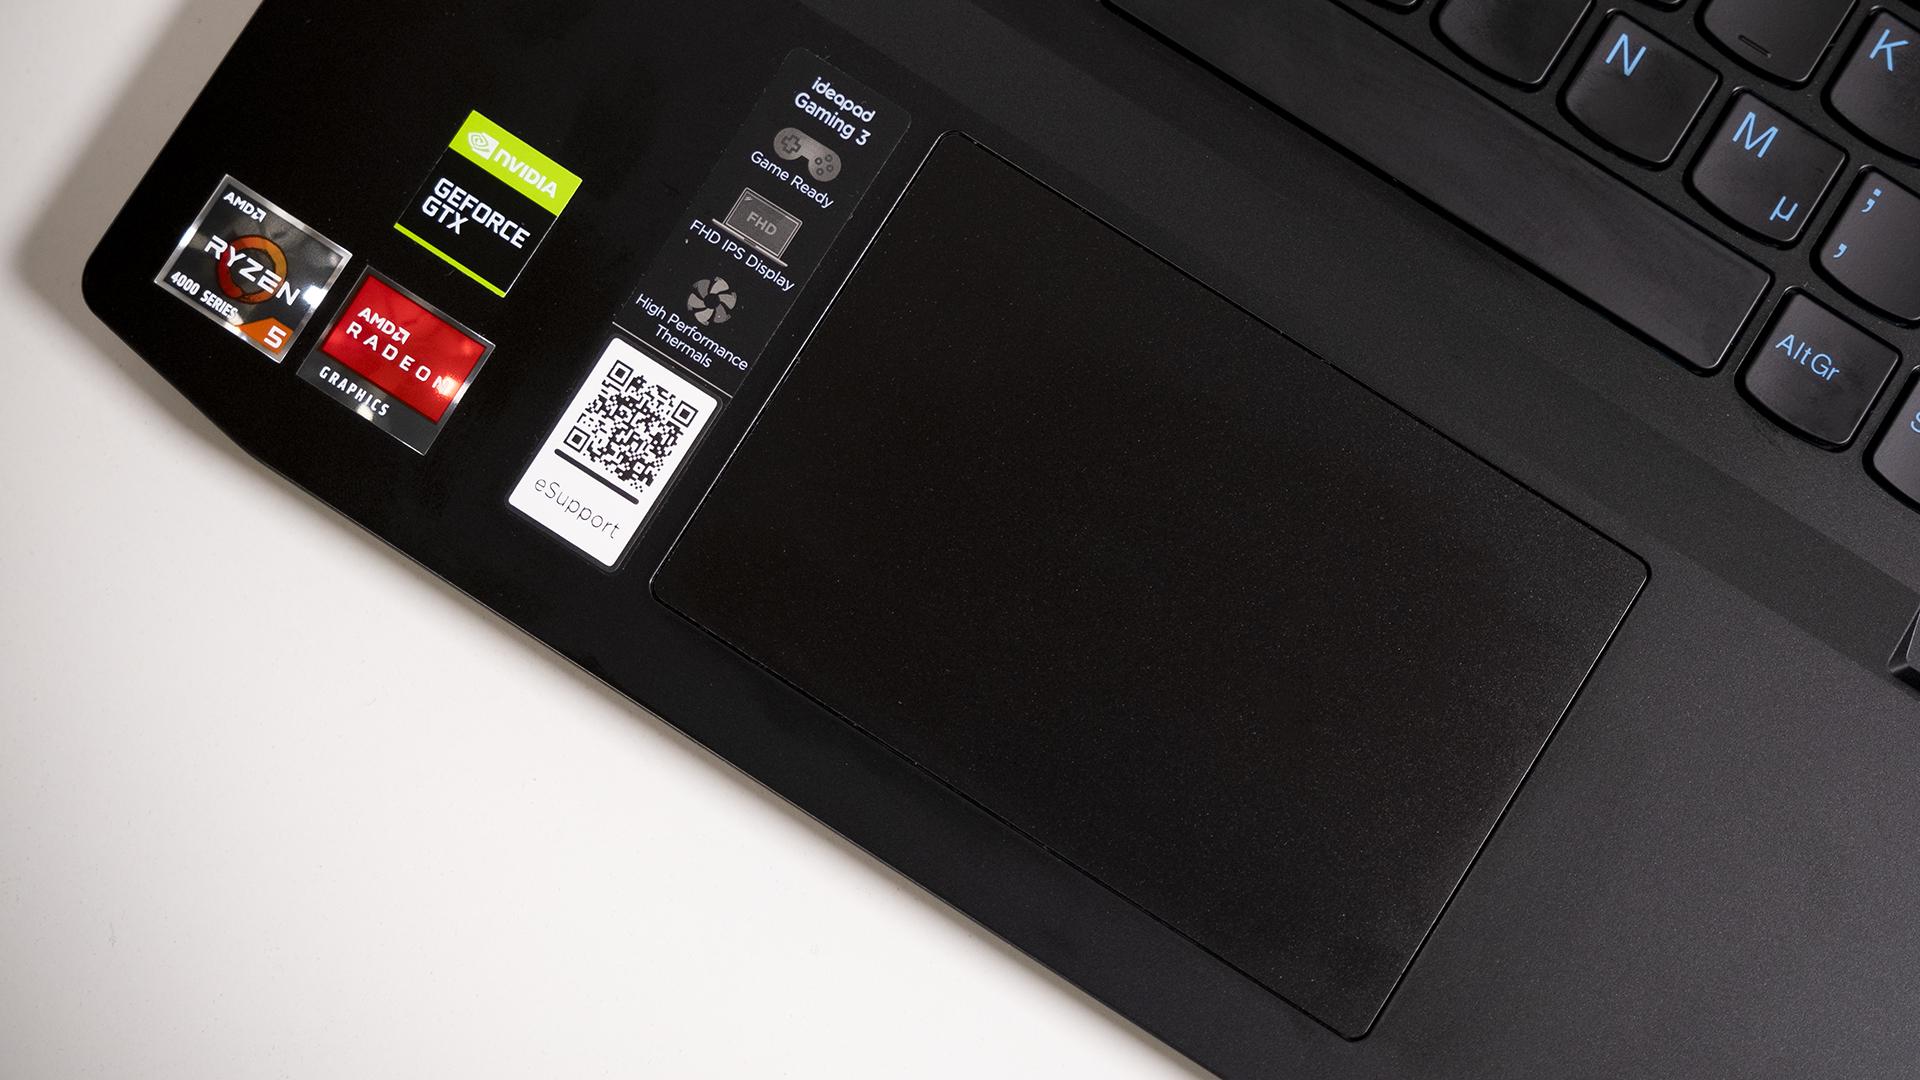 Lenovo IdeaPad Gaming 3 AMD Touchpad